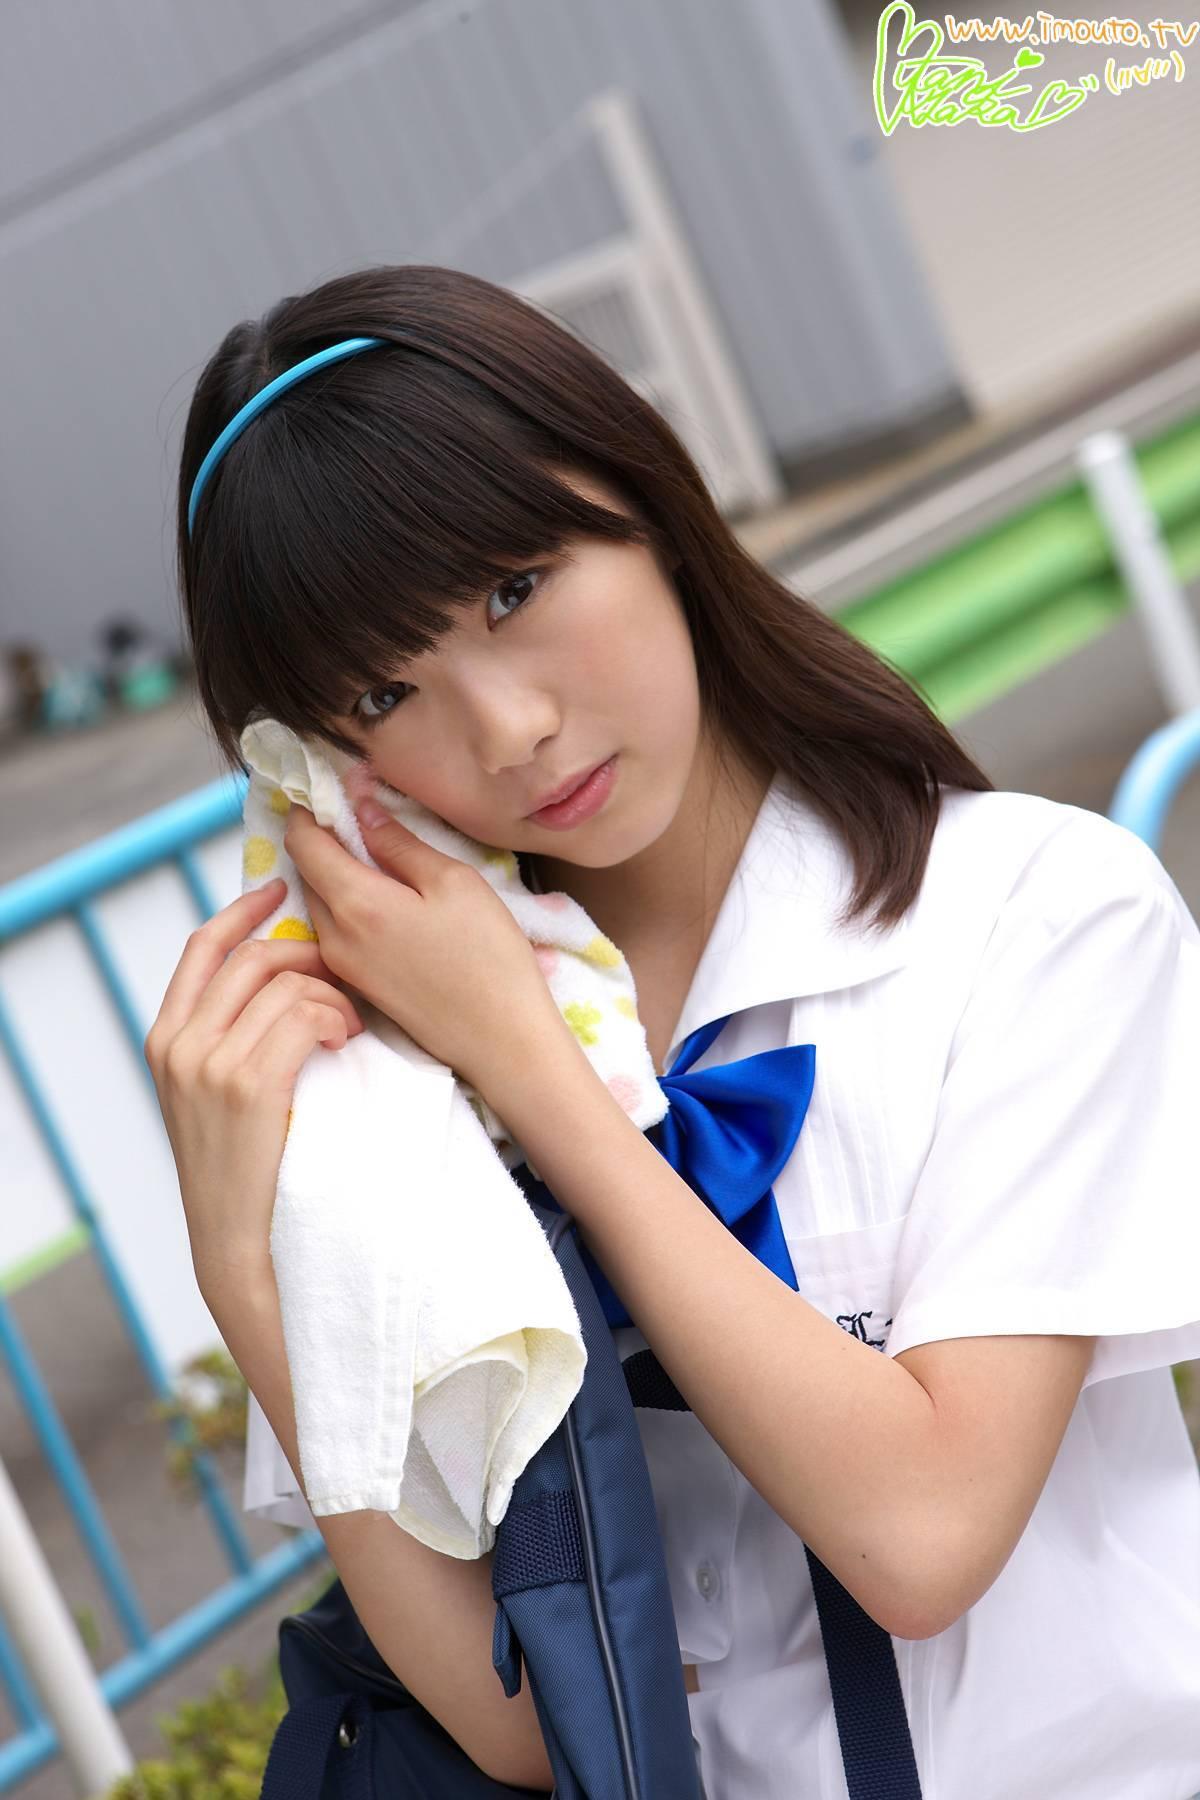 Imouto.tv   大谷彩夏 Ayaka Ootani ~Gallery 01 女优写真